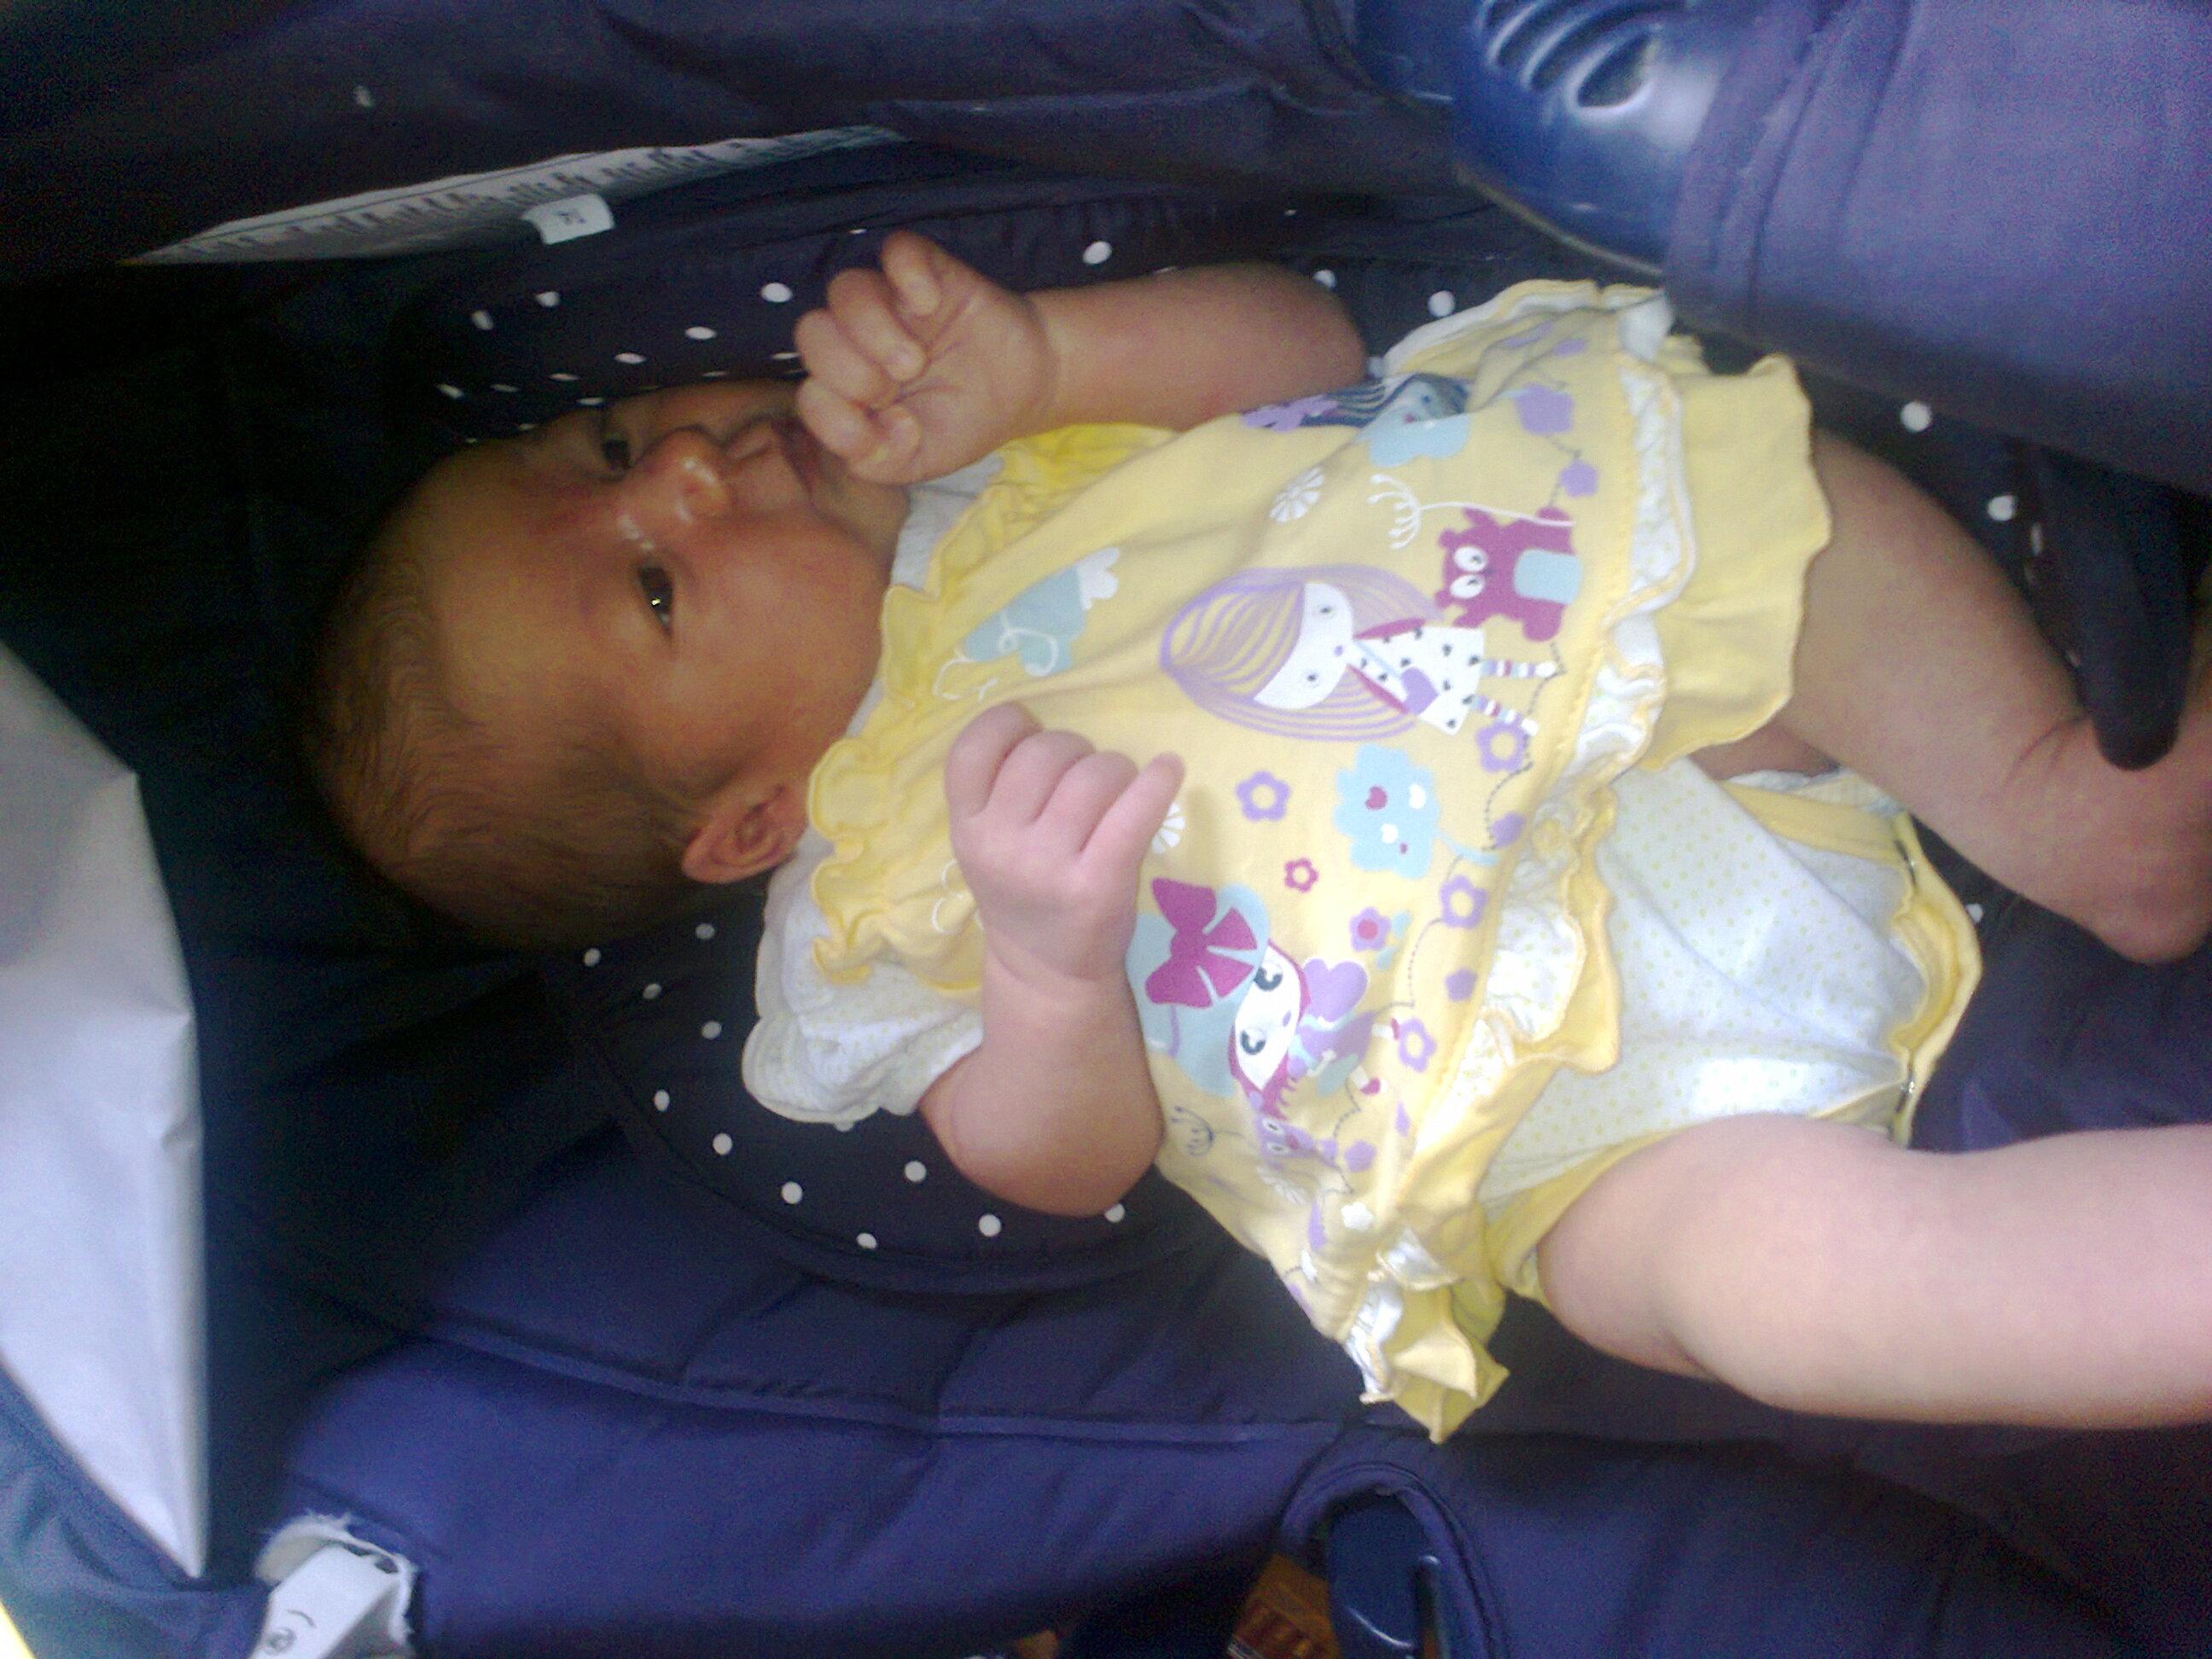 23 days old cute baby girl Boryana